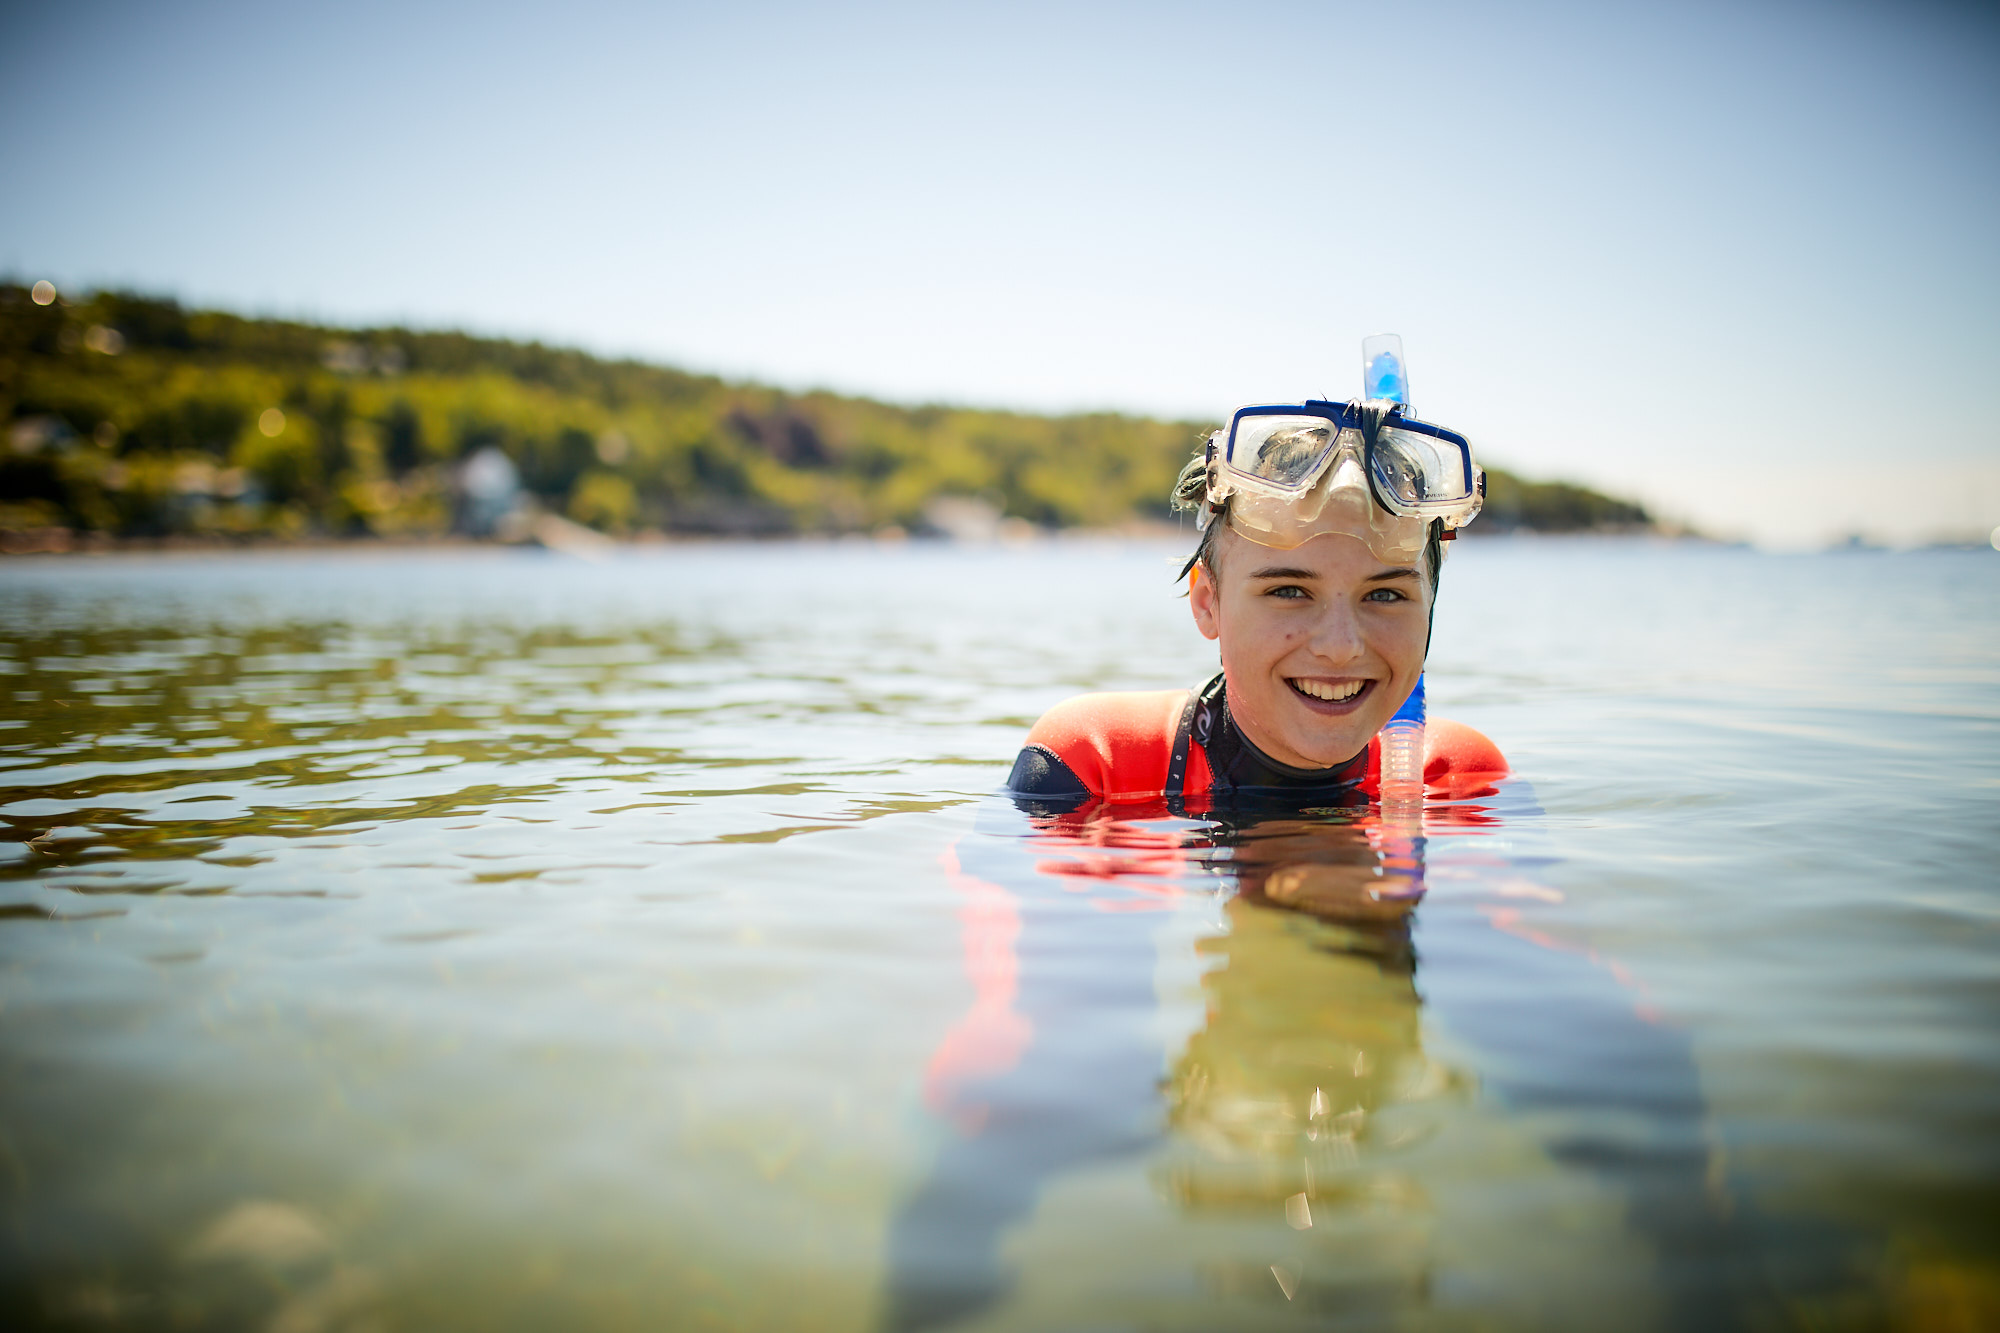 Acadia Institute of Oceanography in Seal Harbor Maine. [All images copyright Matthew Rakola]